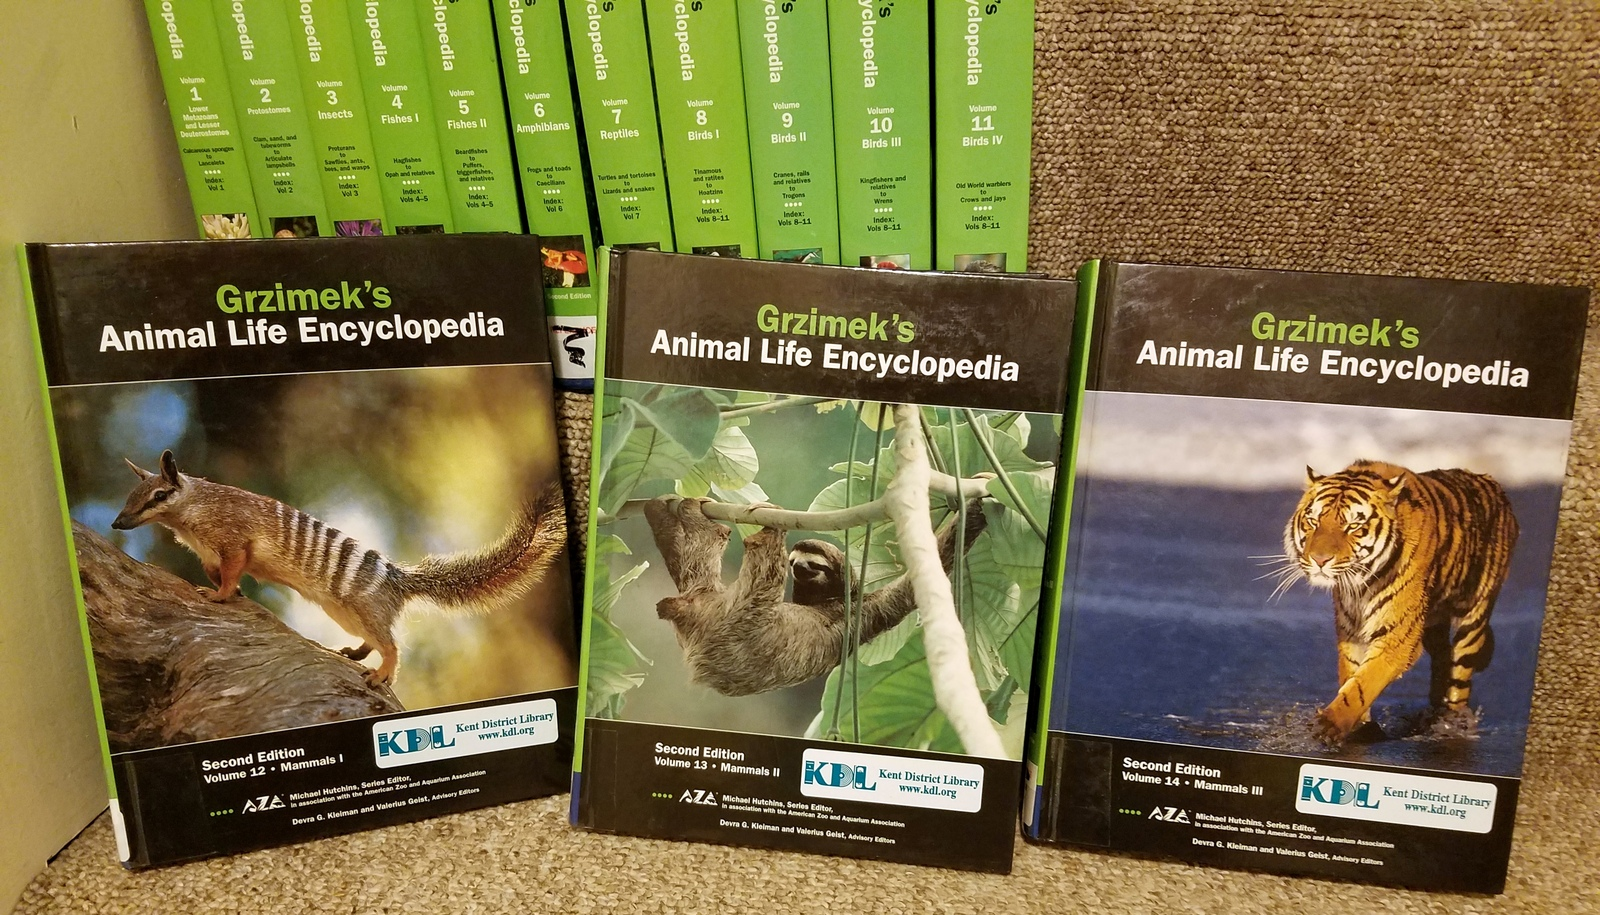 Grzimek's Animal Life Encyclopedia, 17 Volumes Set [Hardcover] [Oct 04, 2002] Hu